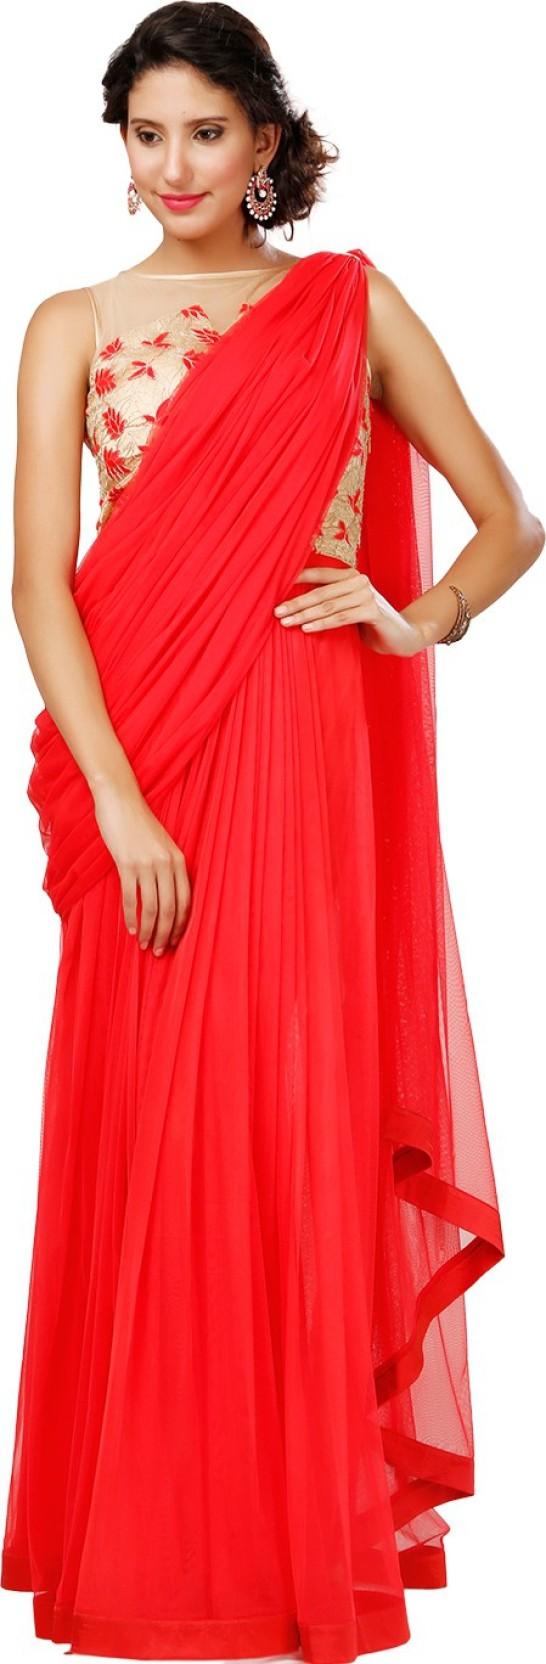 20def22fc50 Eavan Saree Gown Price in India - Buy Eavan Saree Gown online at ...